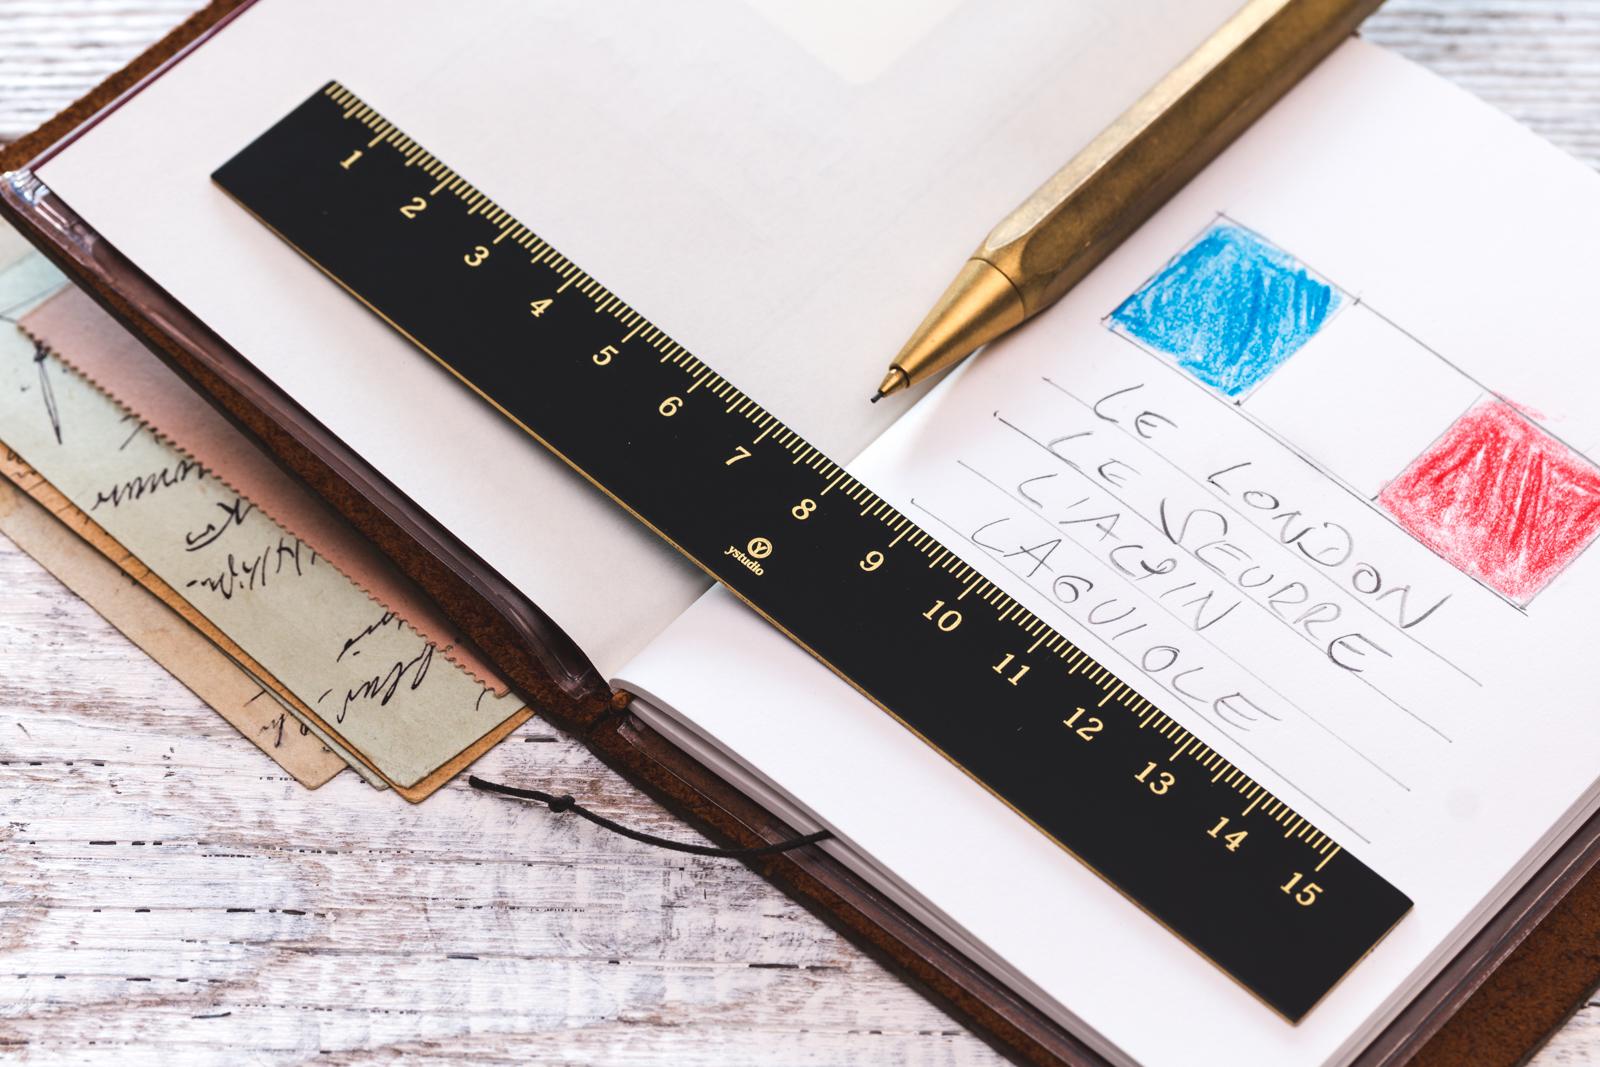 Ystudio - Brassing Ruler